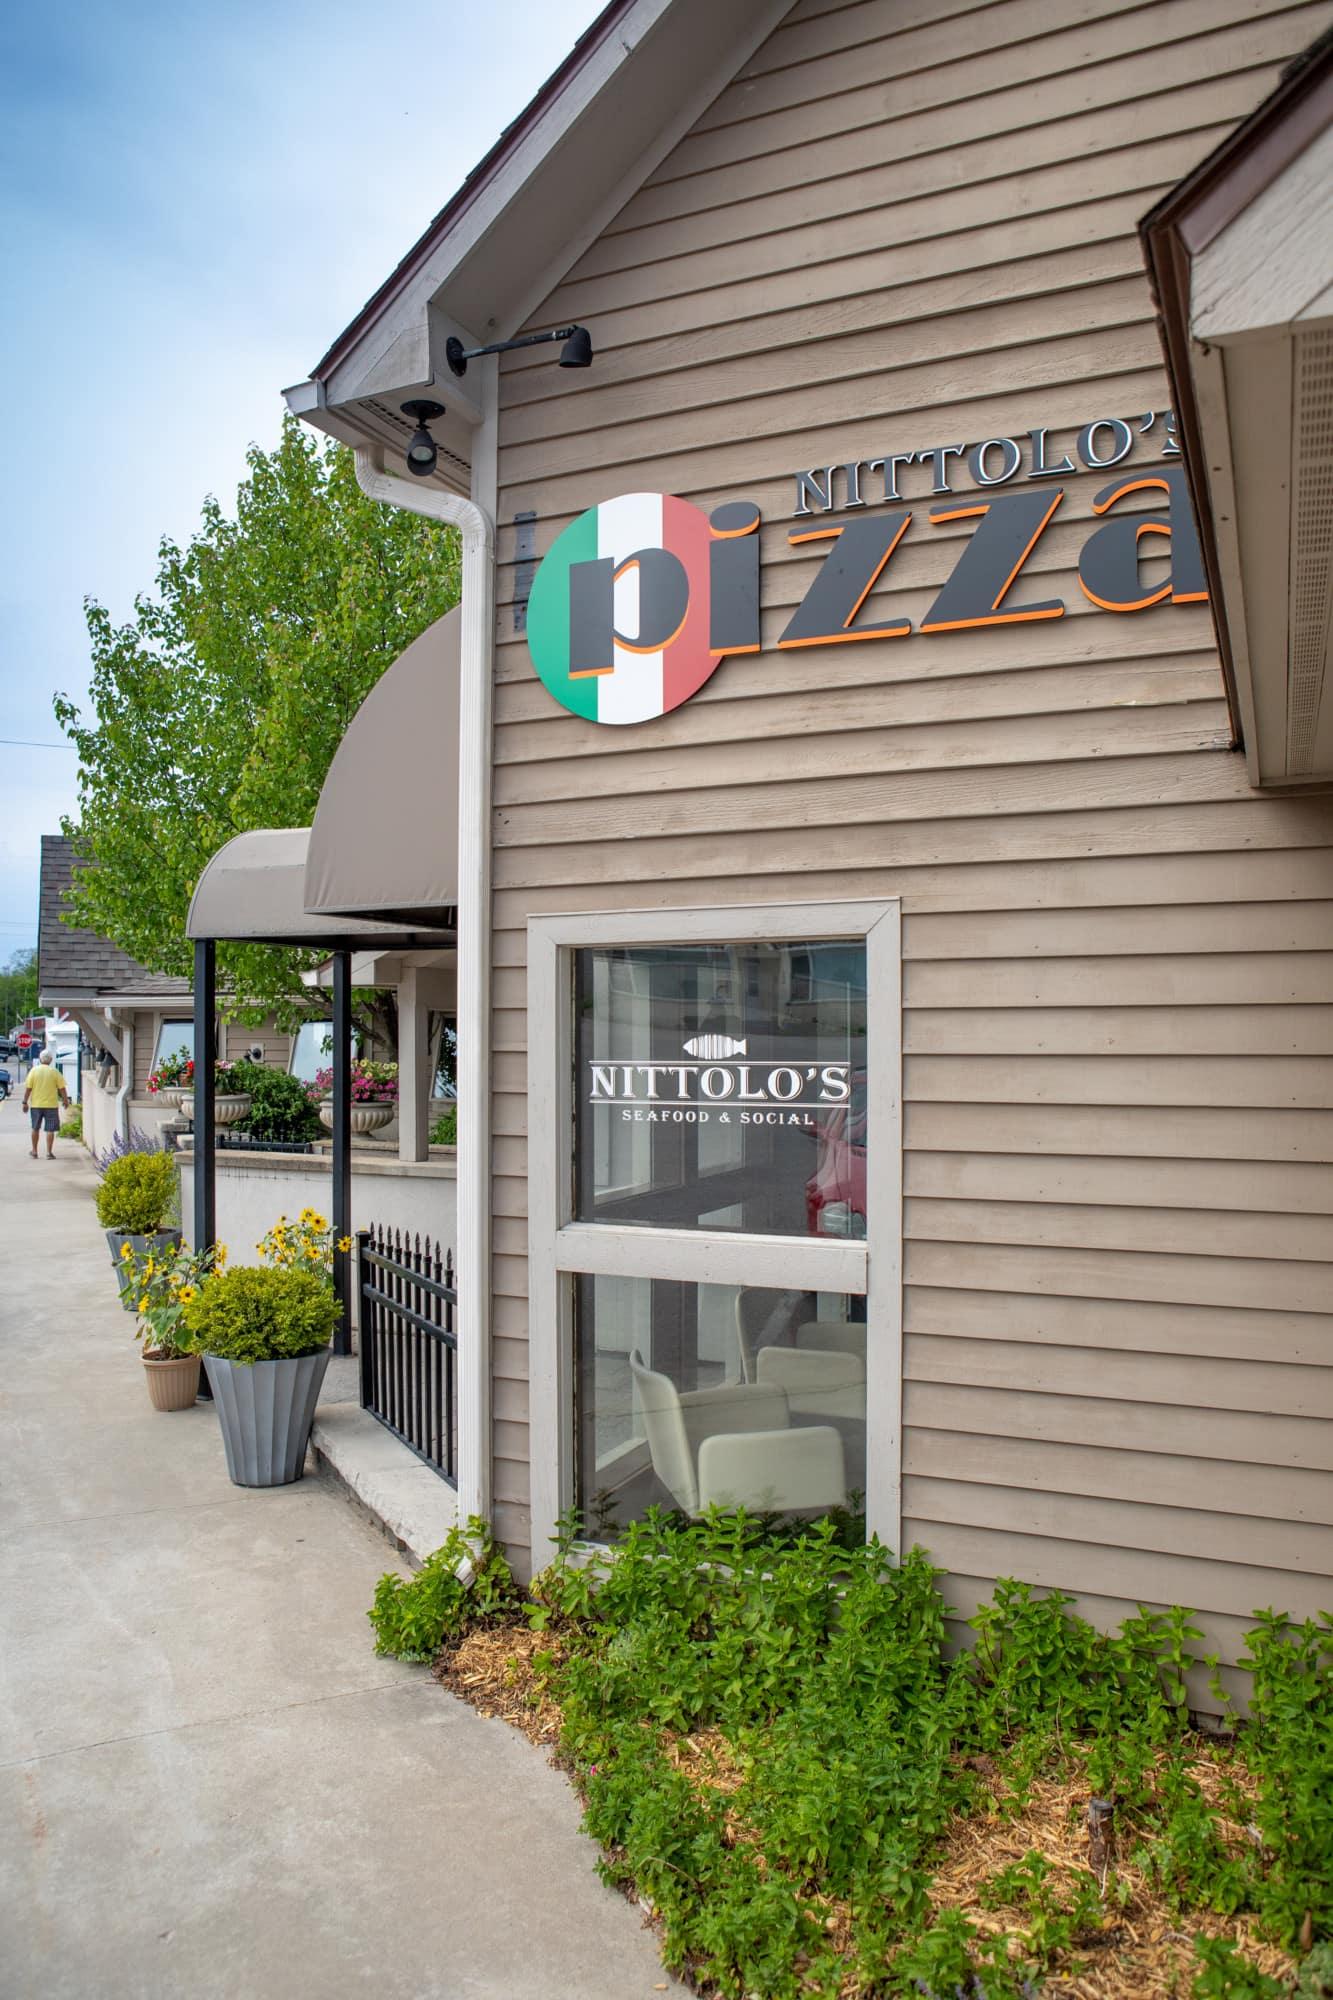 Nittolo's Seafood & Social and Nittolo's Pizza in Lake Leelanau, MI